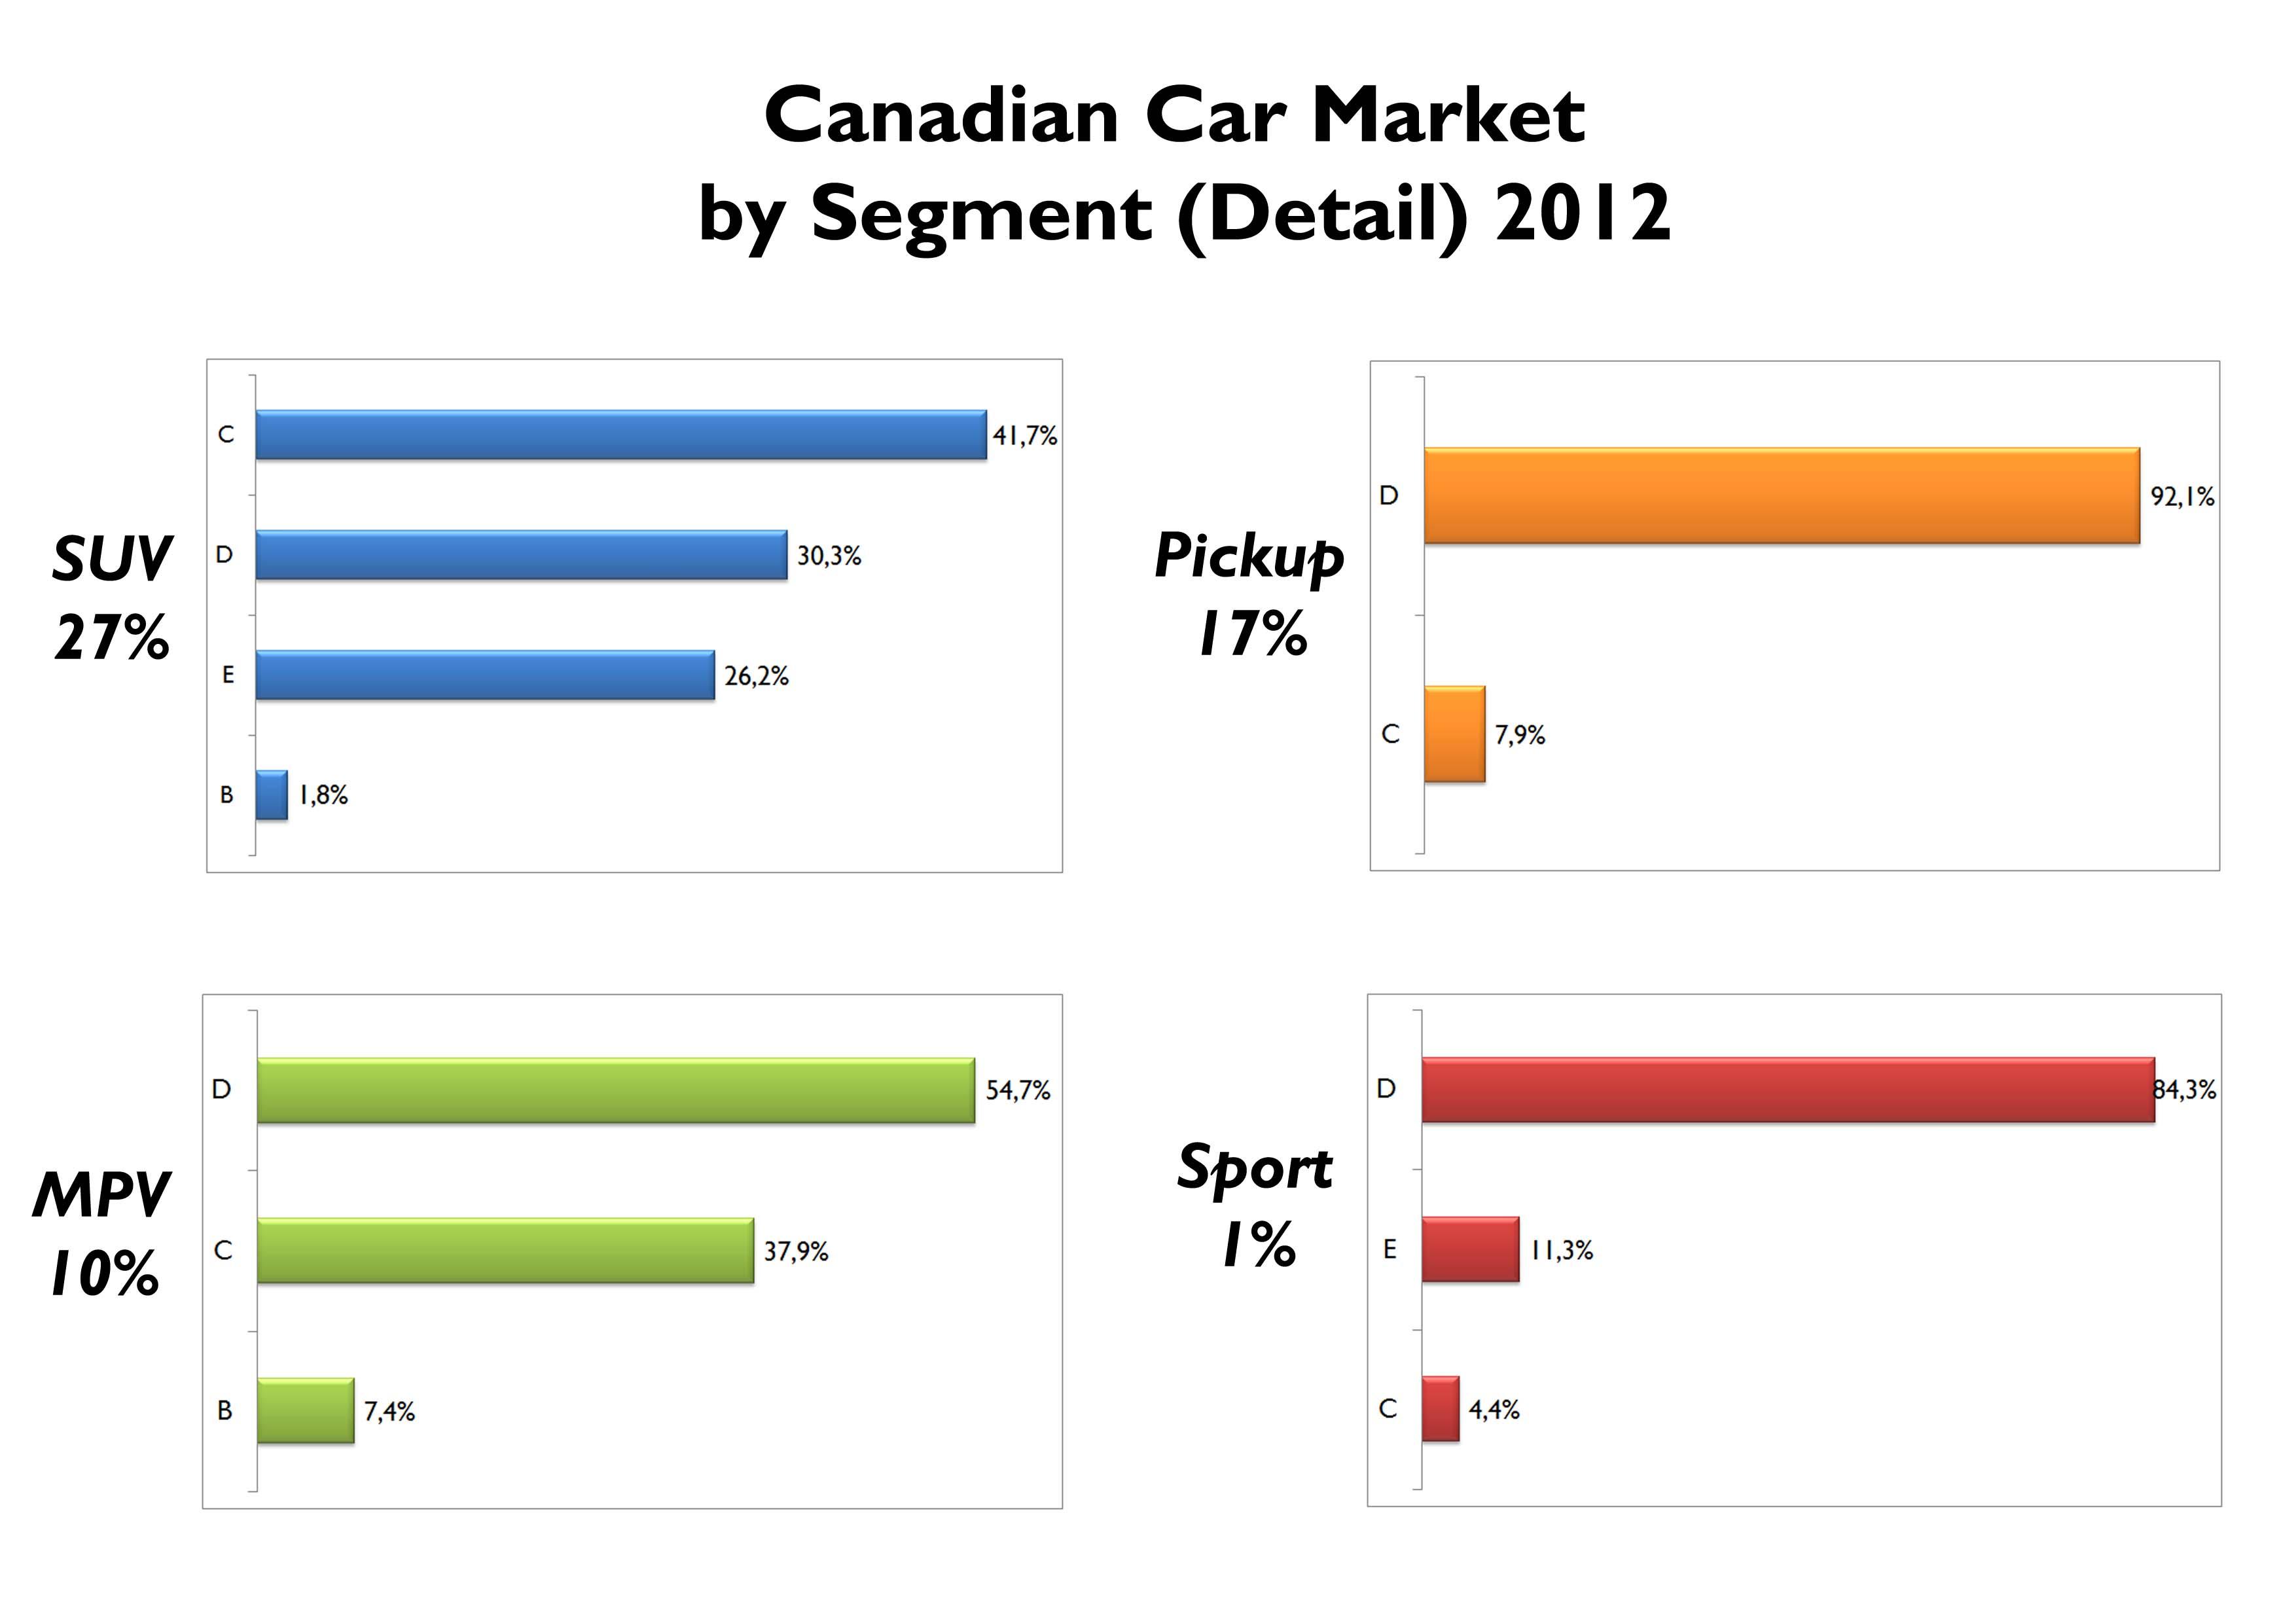 Hybrid Cars Market